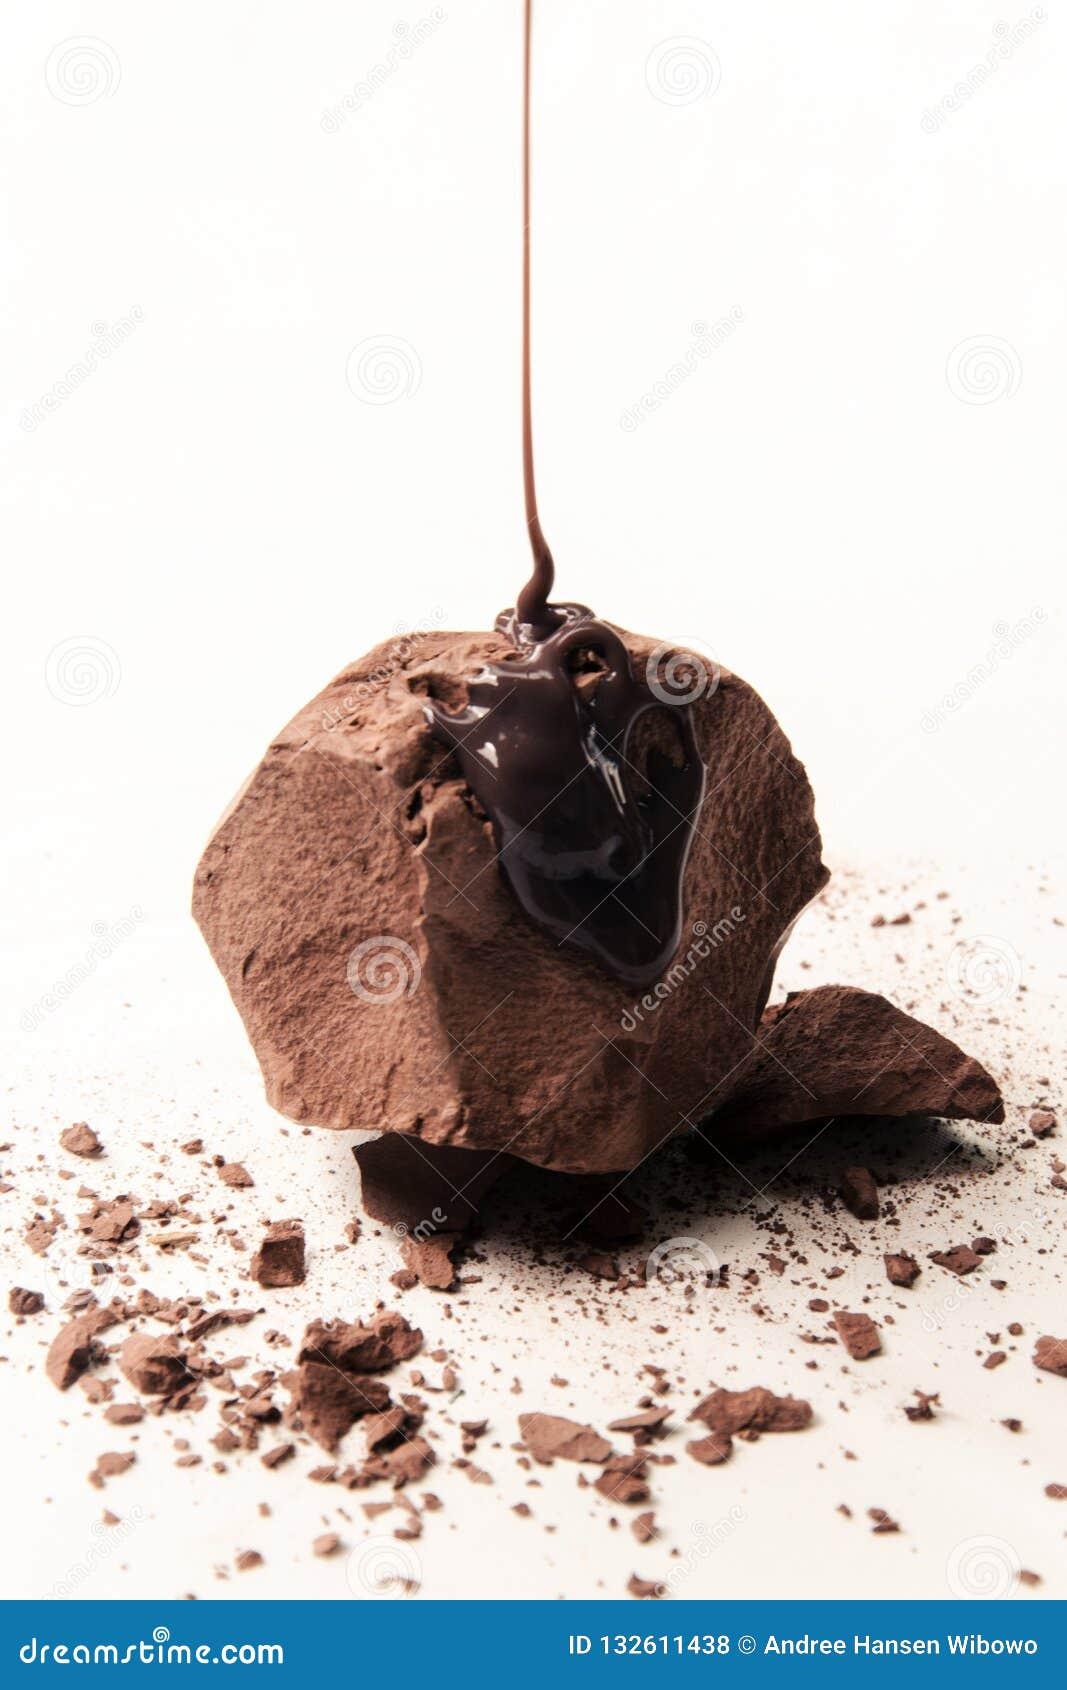 Artisanal chokladtryffel med duggad chokladsås